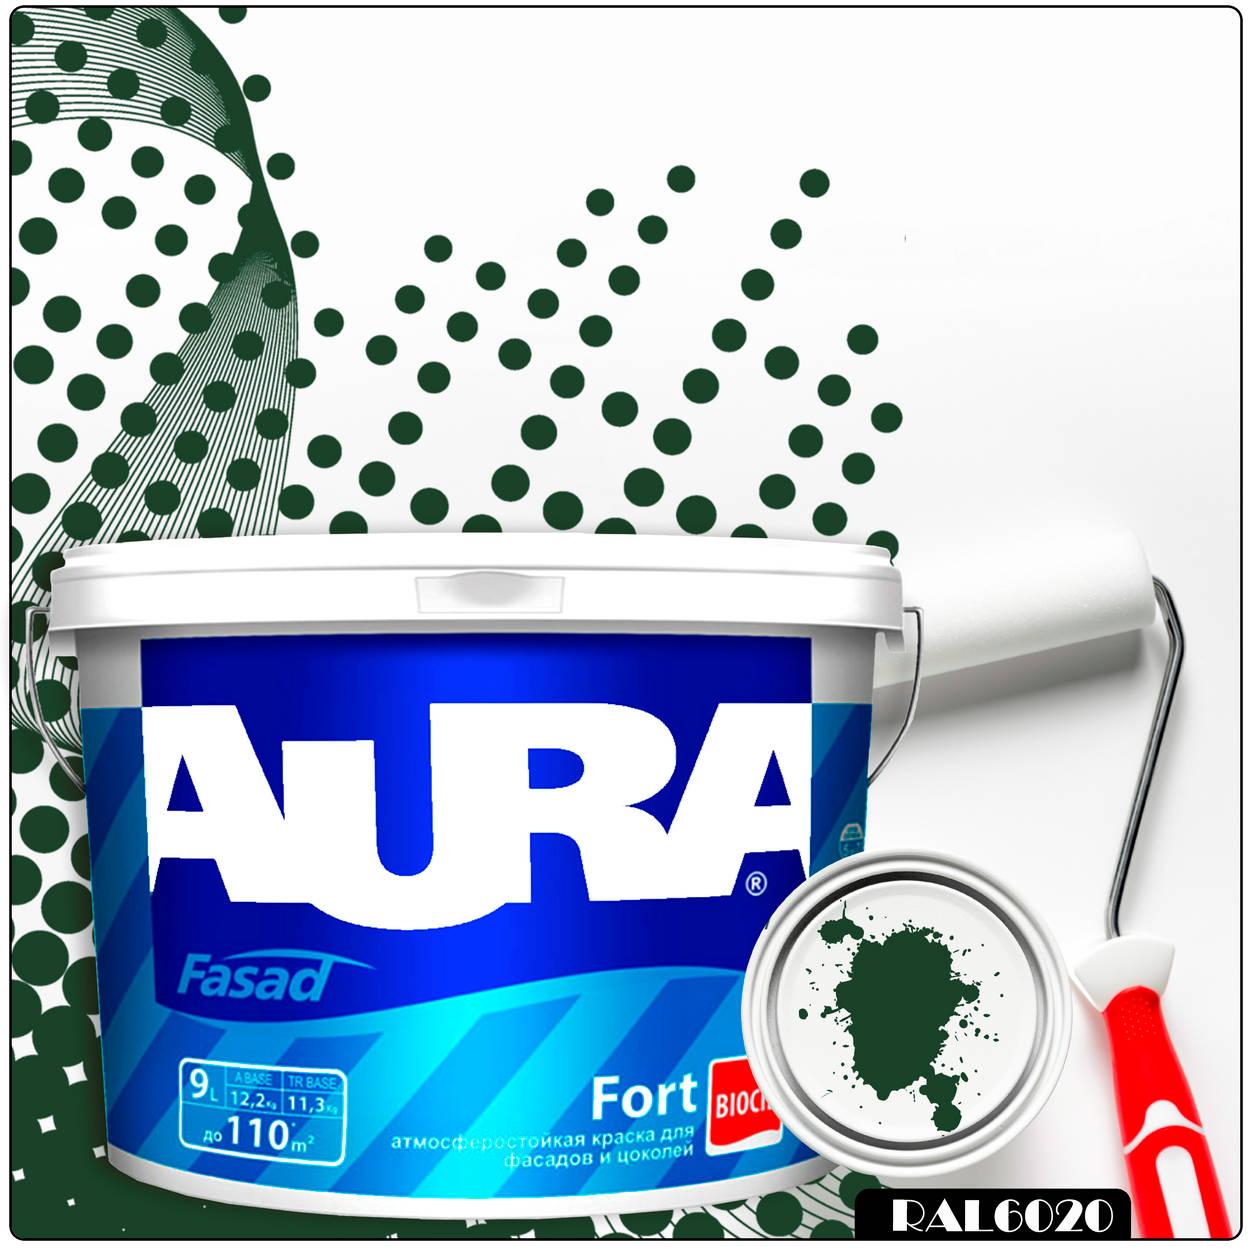 Фото 21 - Краска Aura Fasad Fort, RAL 6020 Зеленый хром, латексная, матовая, для фасада и цоколей, 9л, Аура.